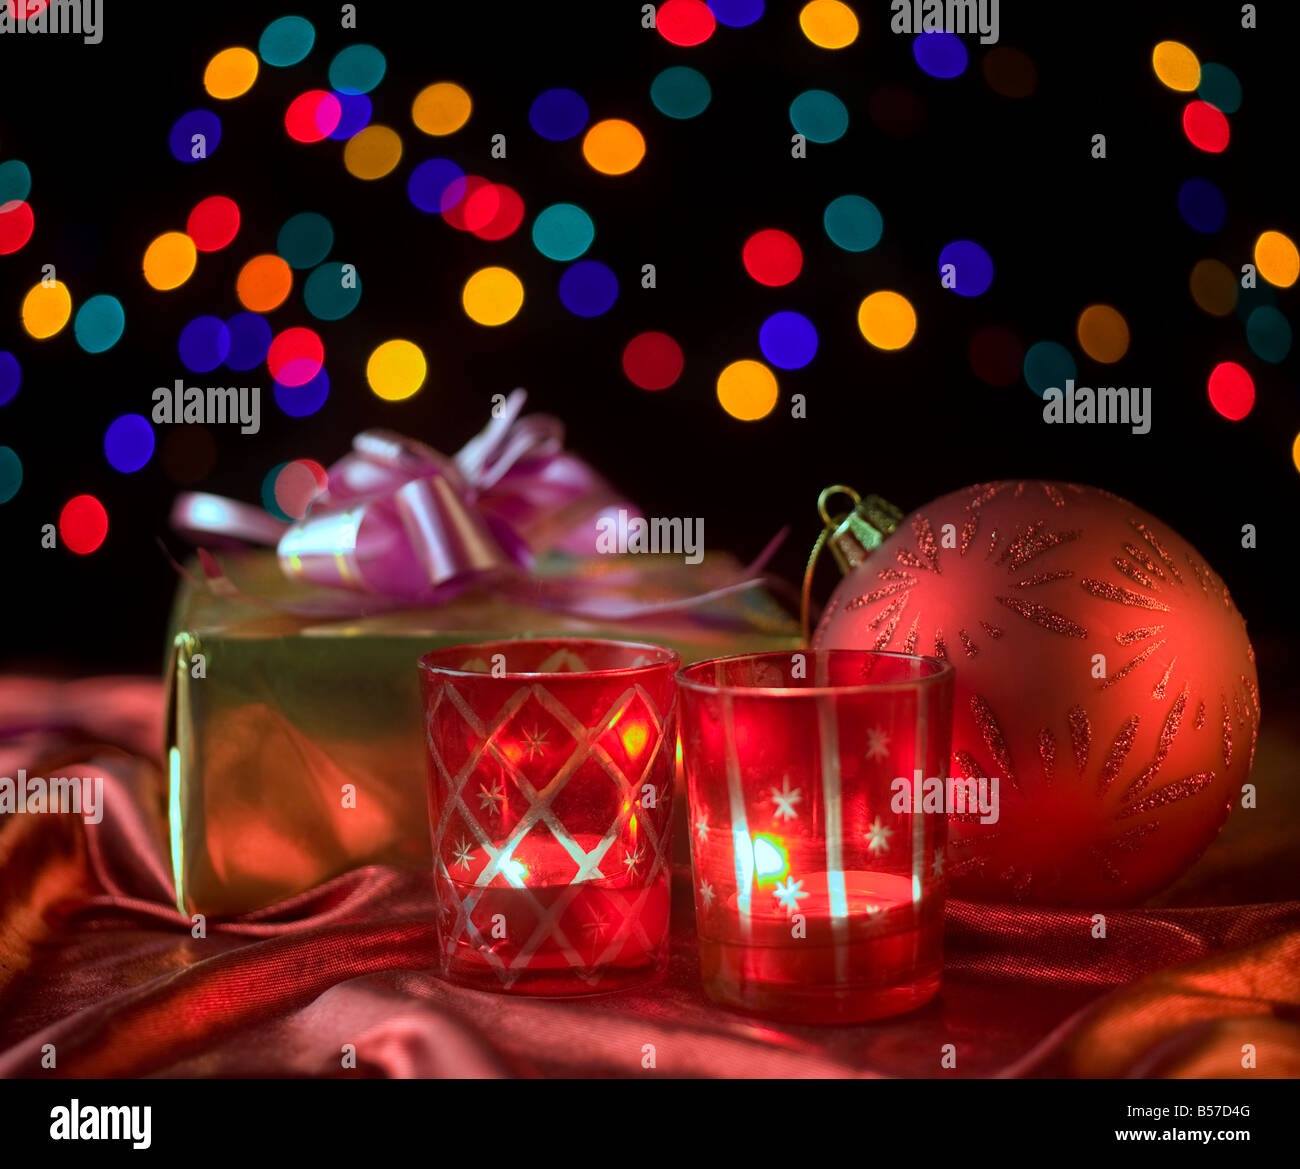 Kerzen leuchten Ornament Weihnachtskugel Stockfoto, Bild: 20447632 ...